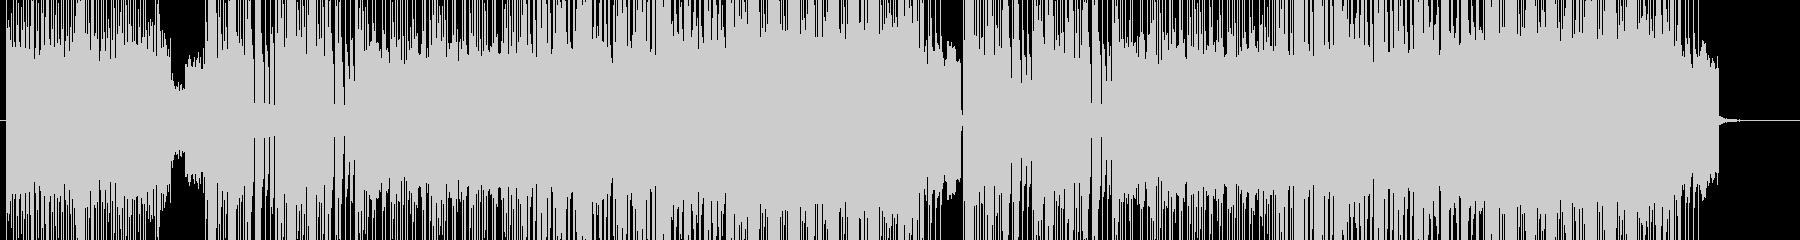 「HR/HM」「DARK」BGM54の未再生の波形